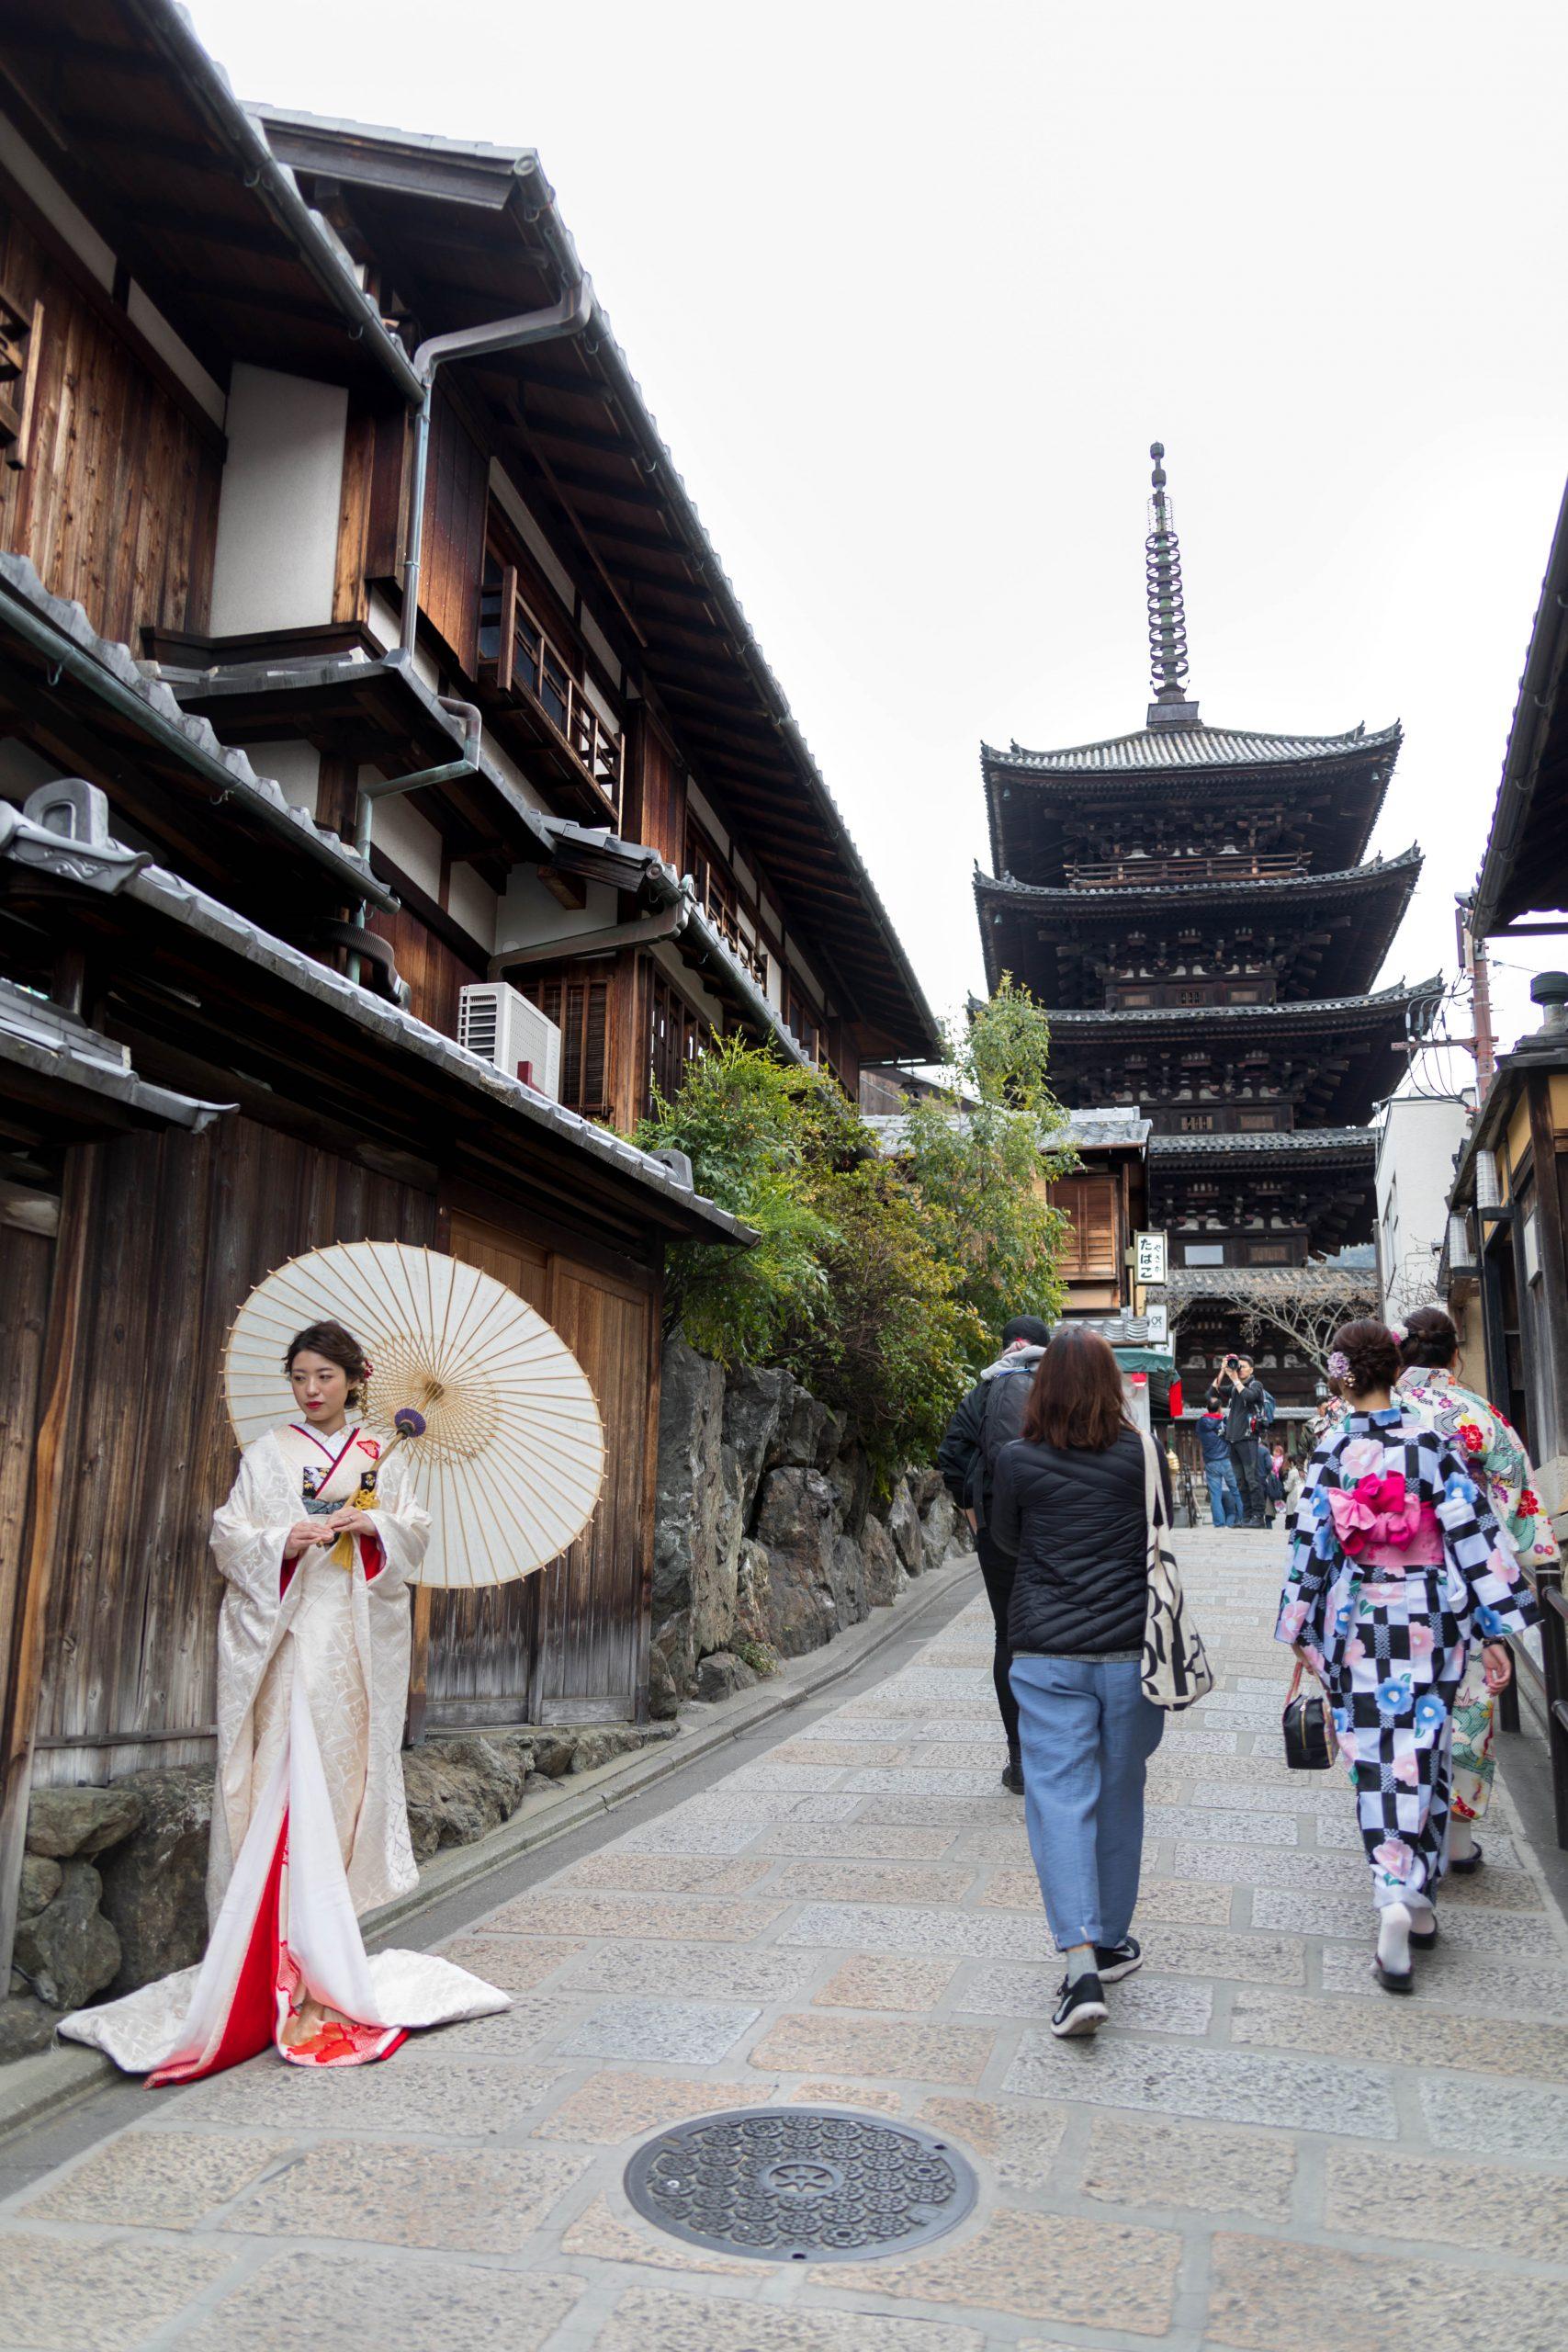 Yasaka Pagoda at Hōkan-ji Temple Yasaka no Tou in Kyoto Japan Photographed by Annie Fairfax